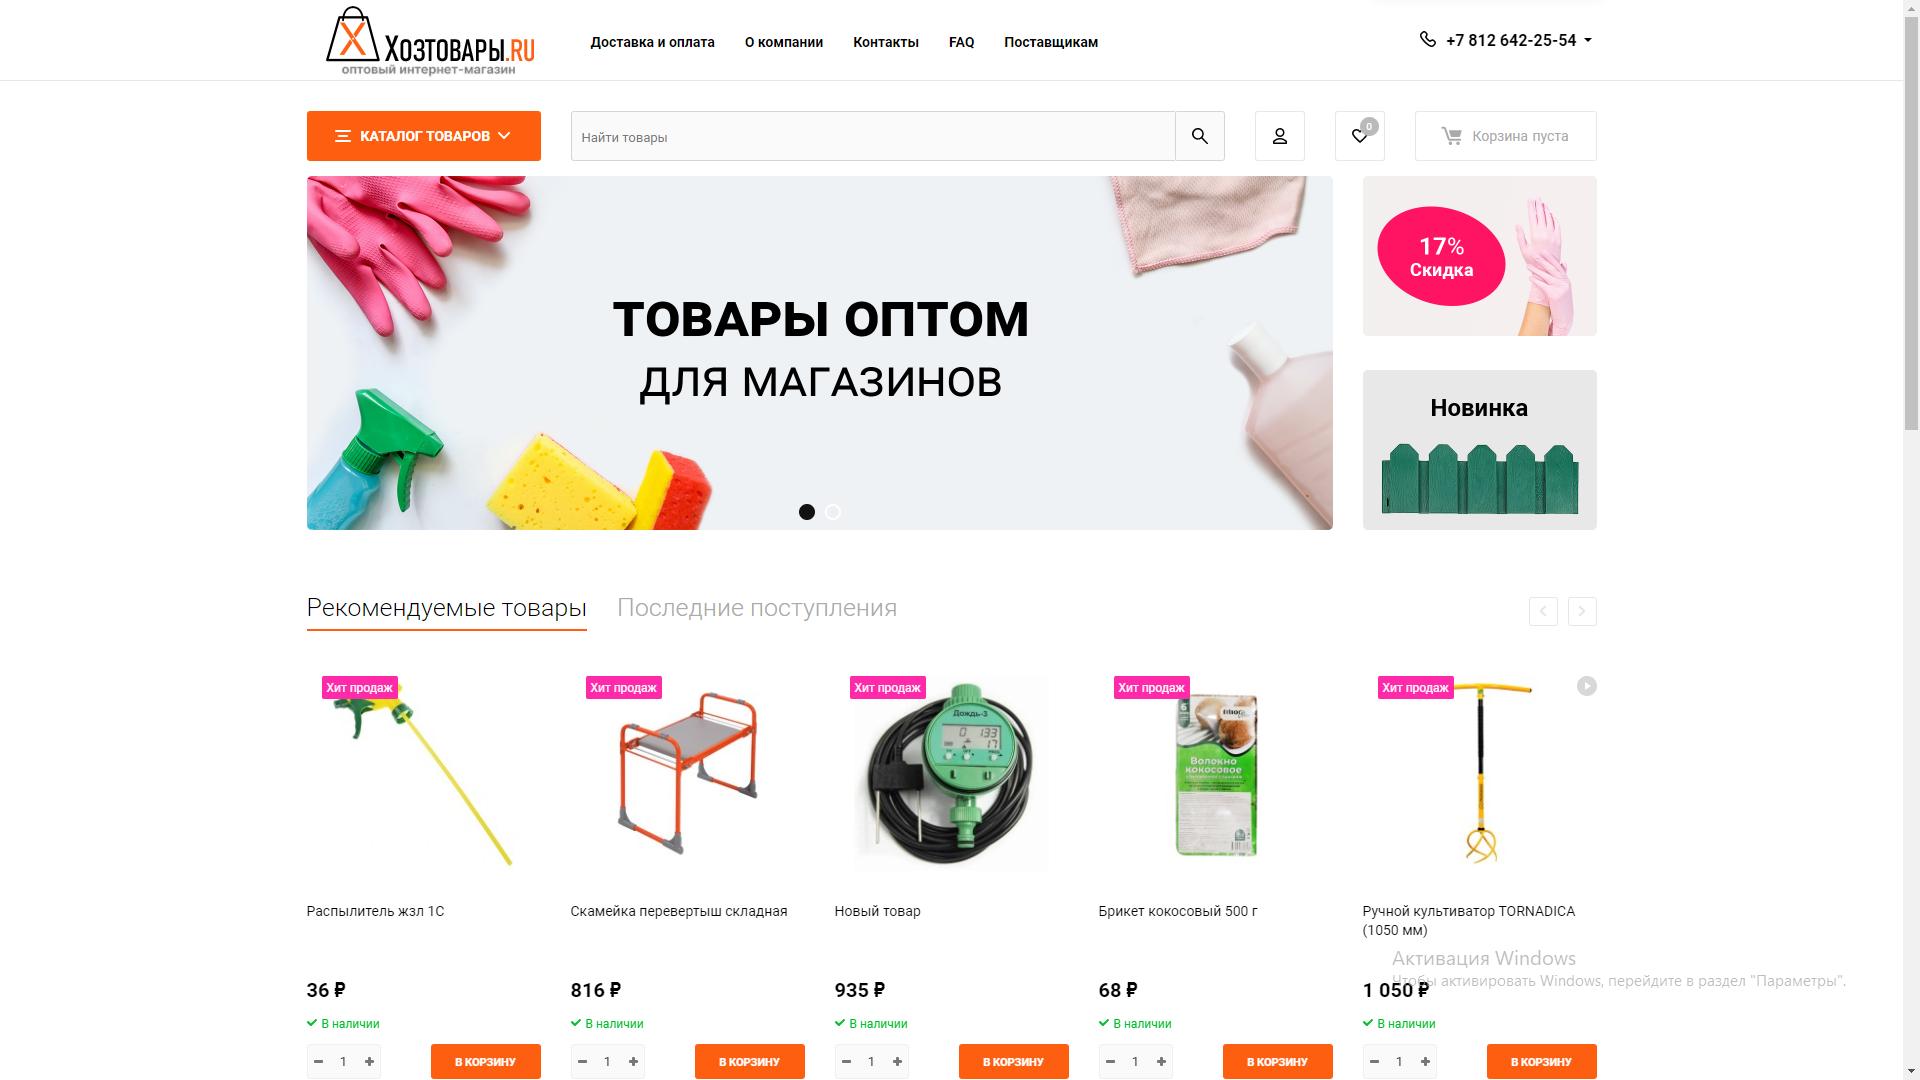 Разработка логотипа для оптового интернет-магазина «Хозтовары.ру» фото f_144606ca71e99815.png